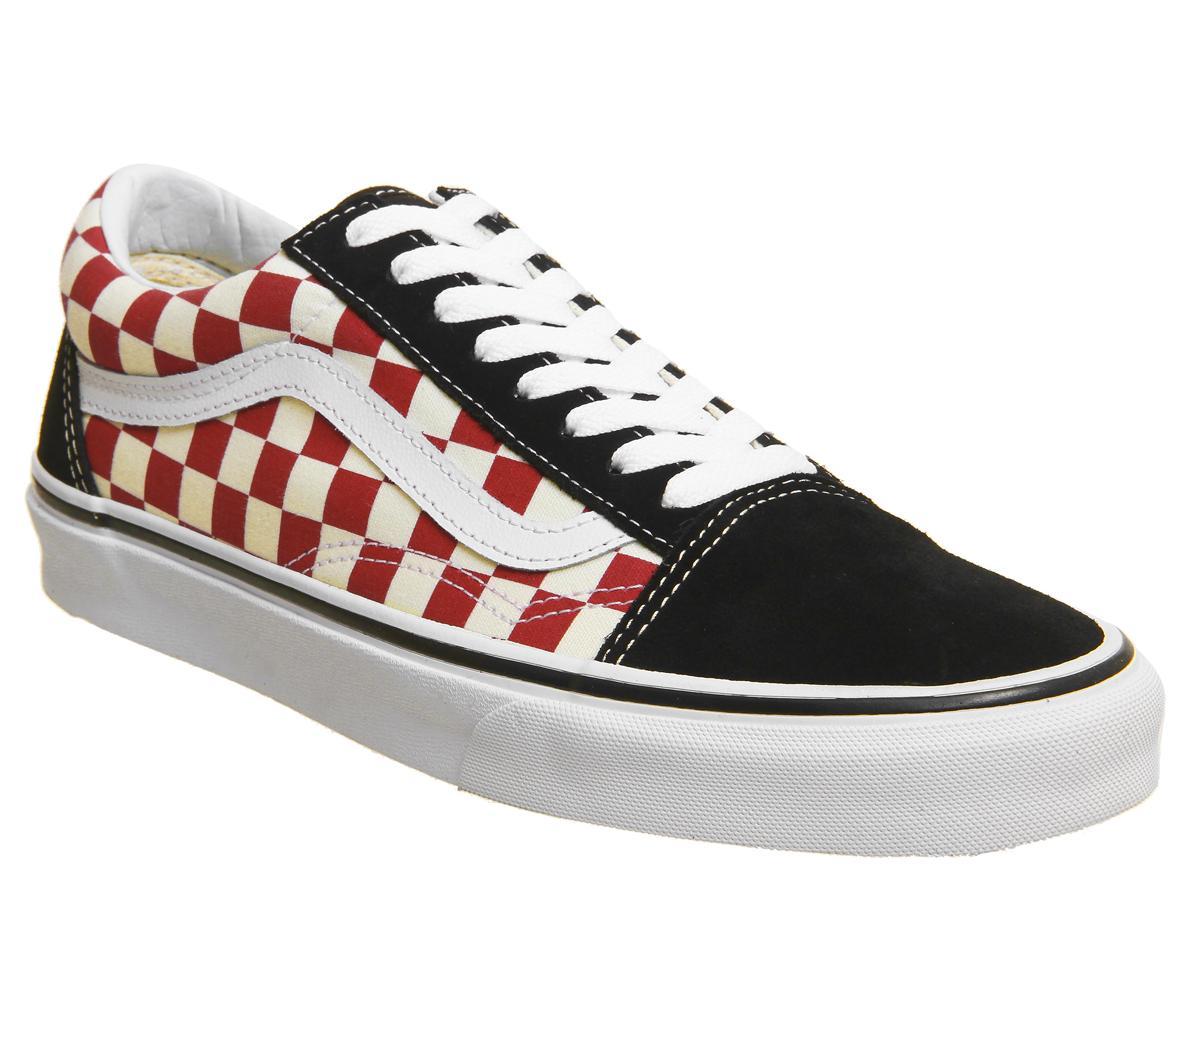 Vans Old Skool Trainers Black Red Checkerboard His trainers